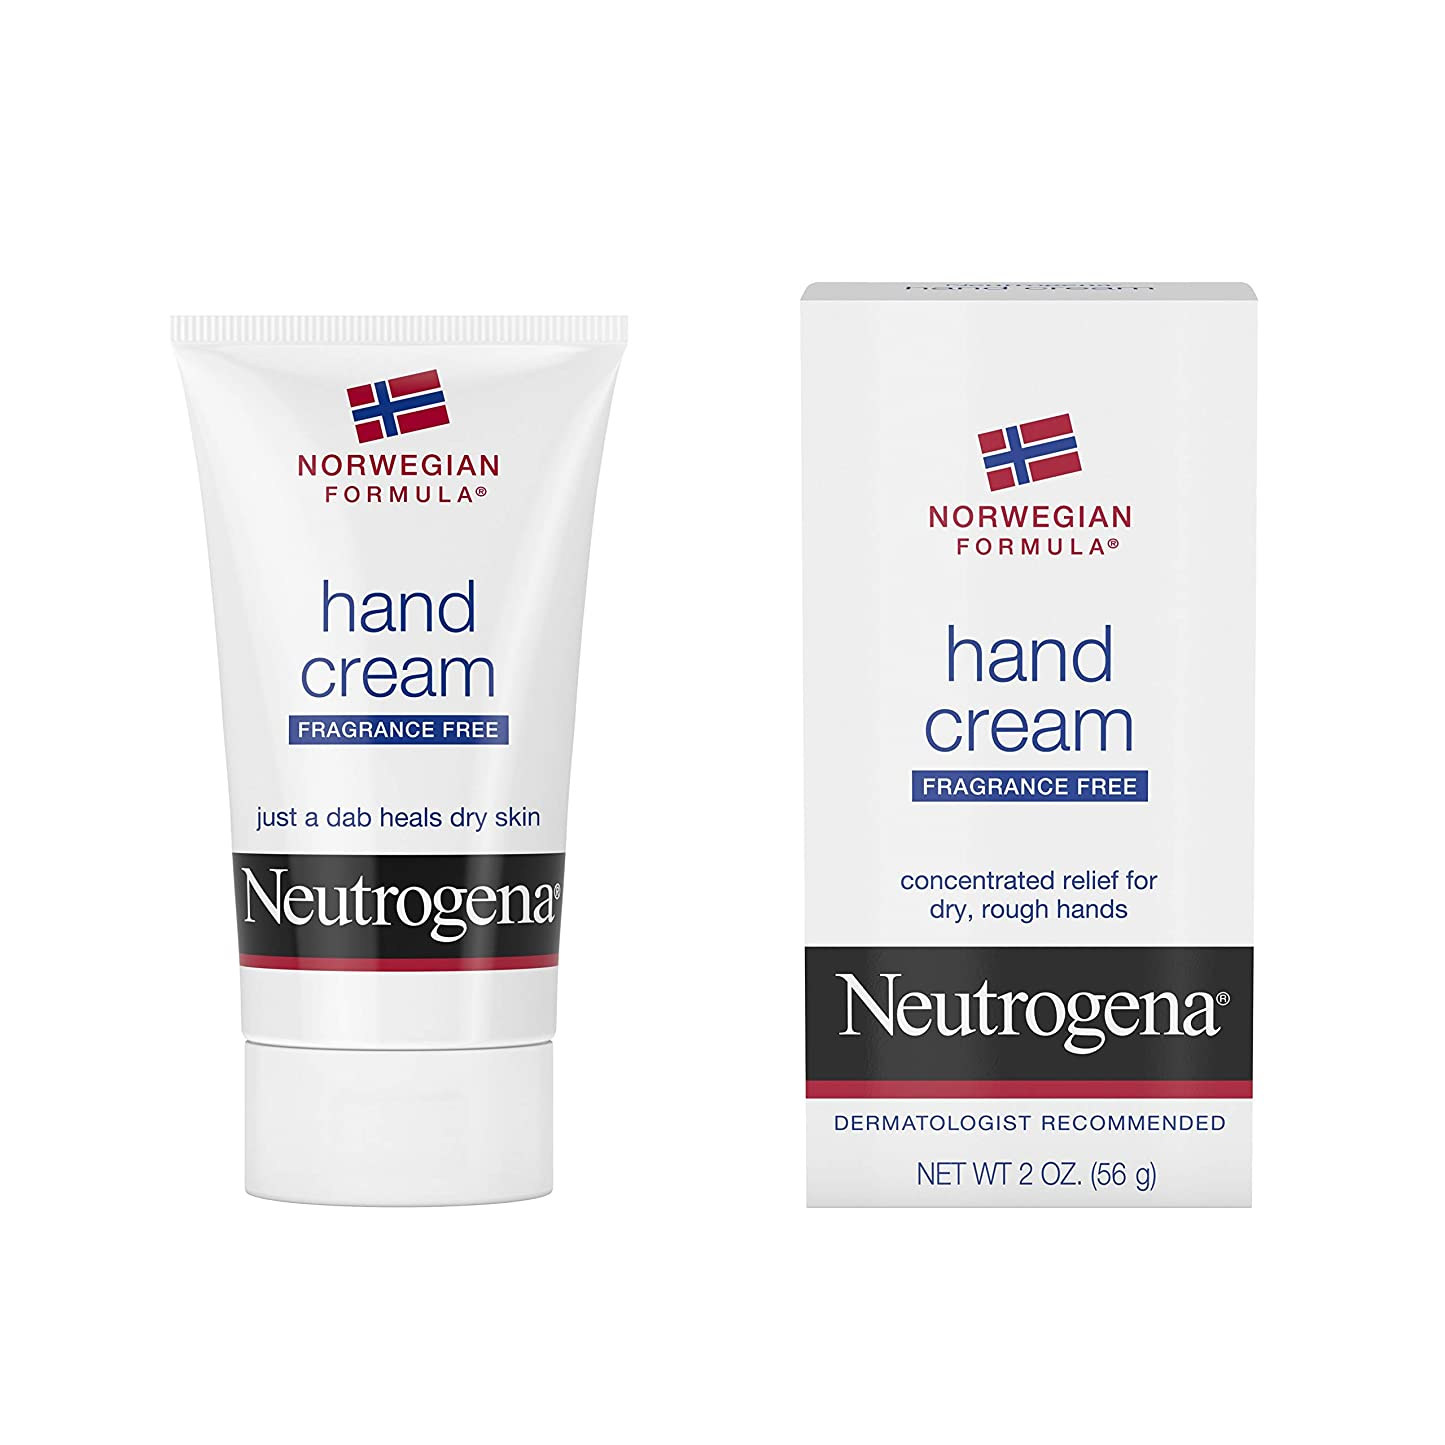 共産主義拘束暴行Neutrogena Norwegian Formula Hand Cream Fragrance-Free 60 ml (並行輸入品)